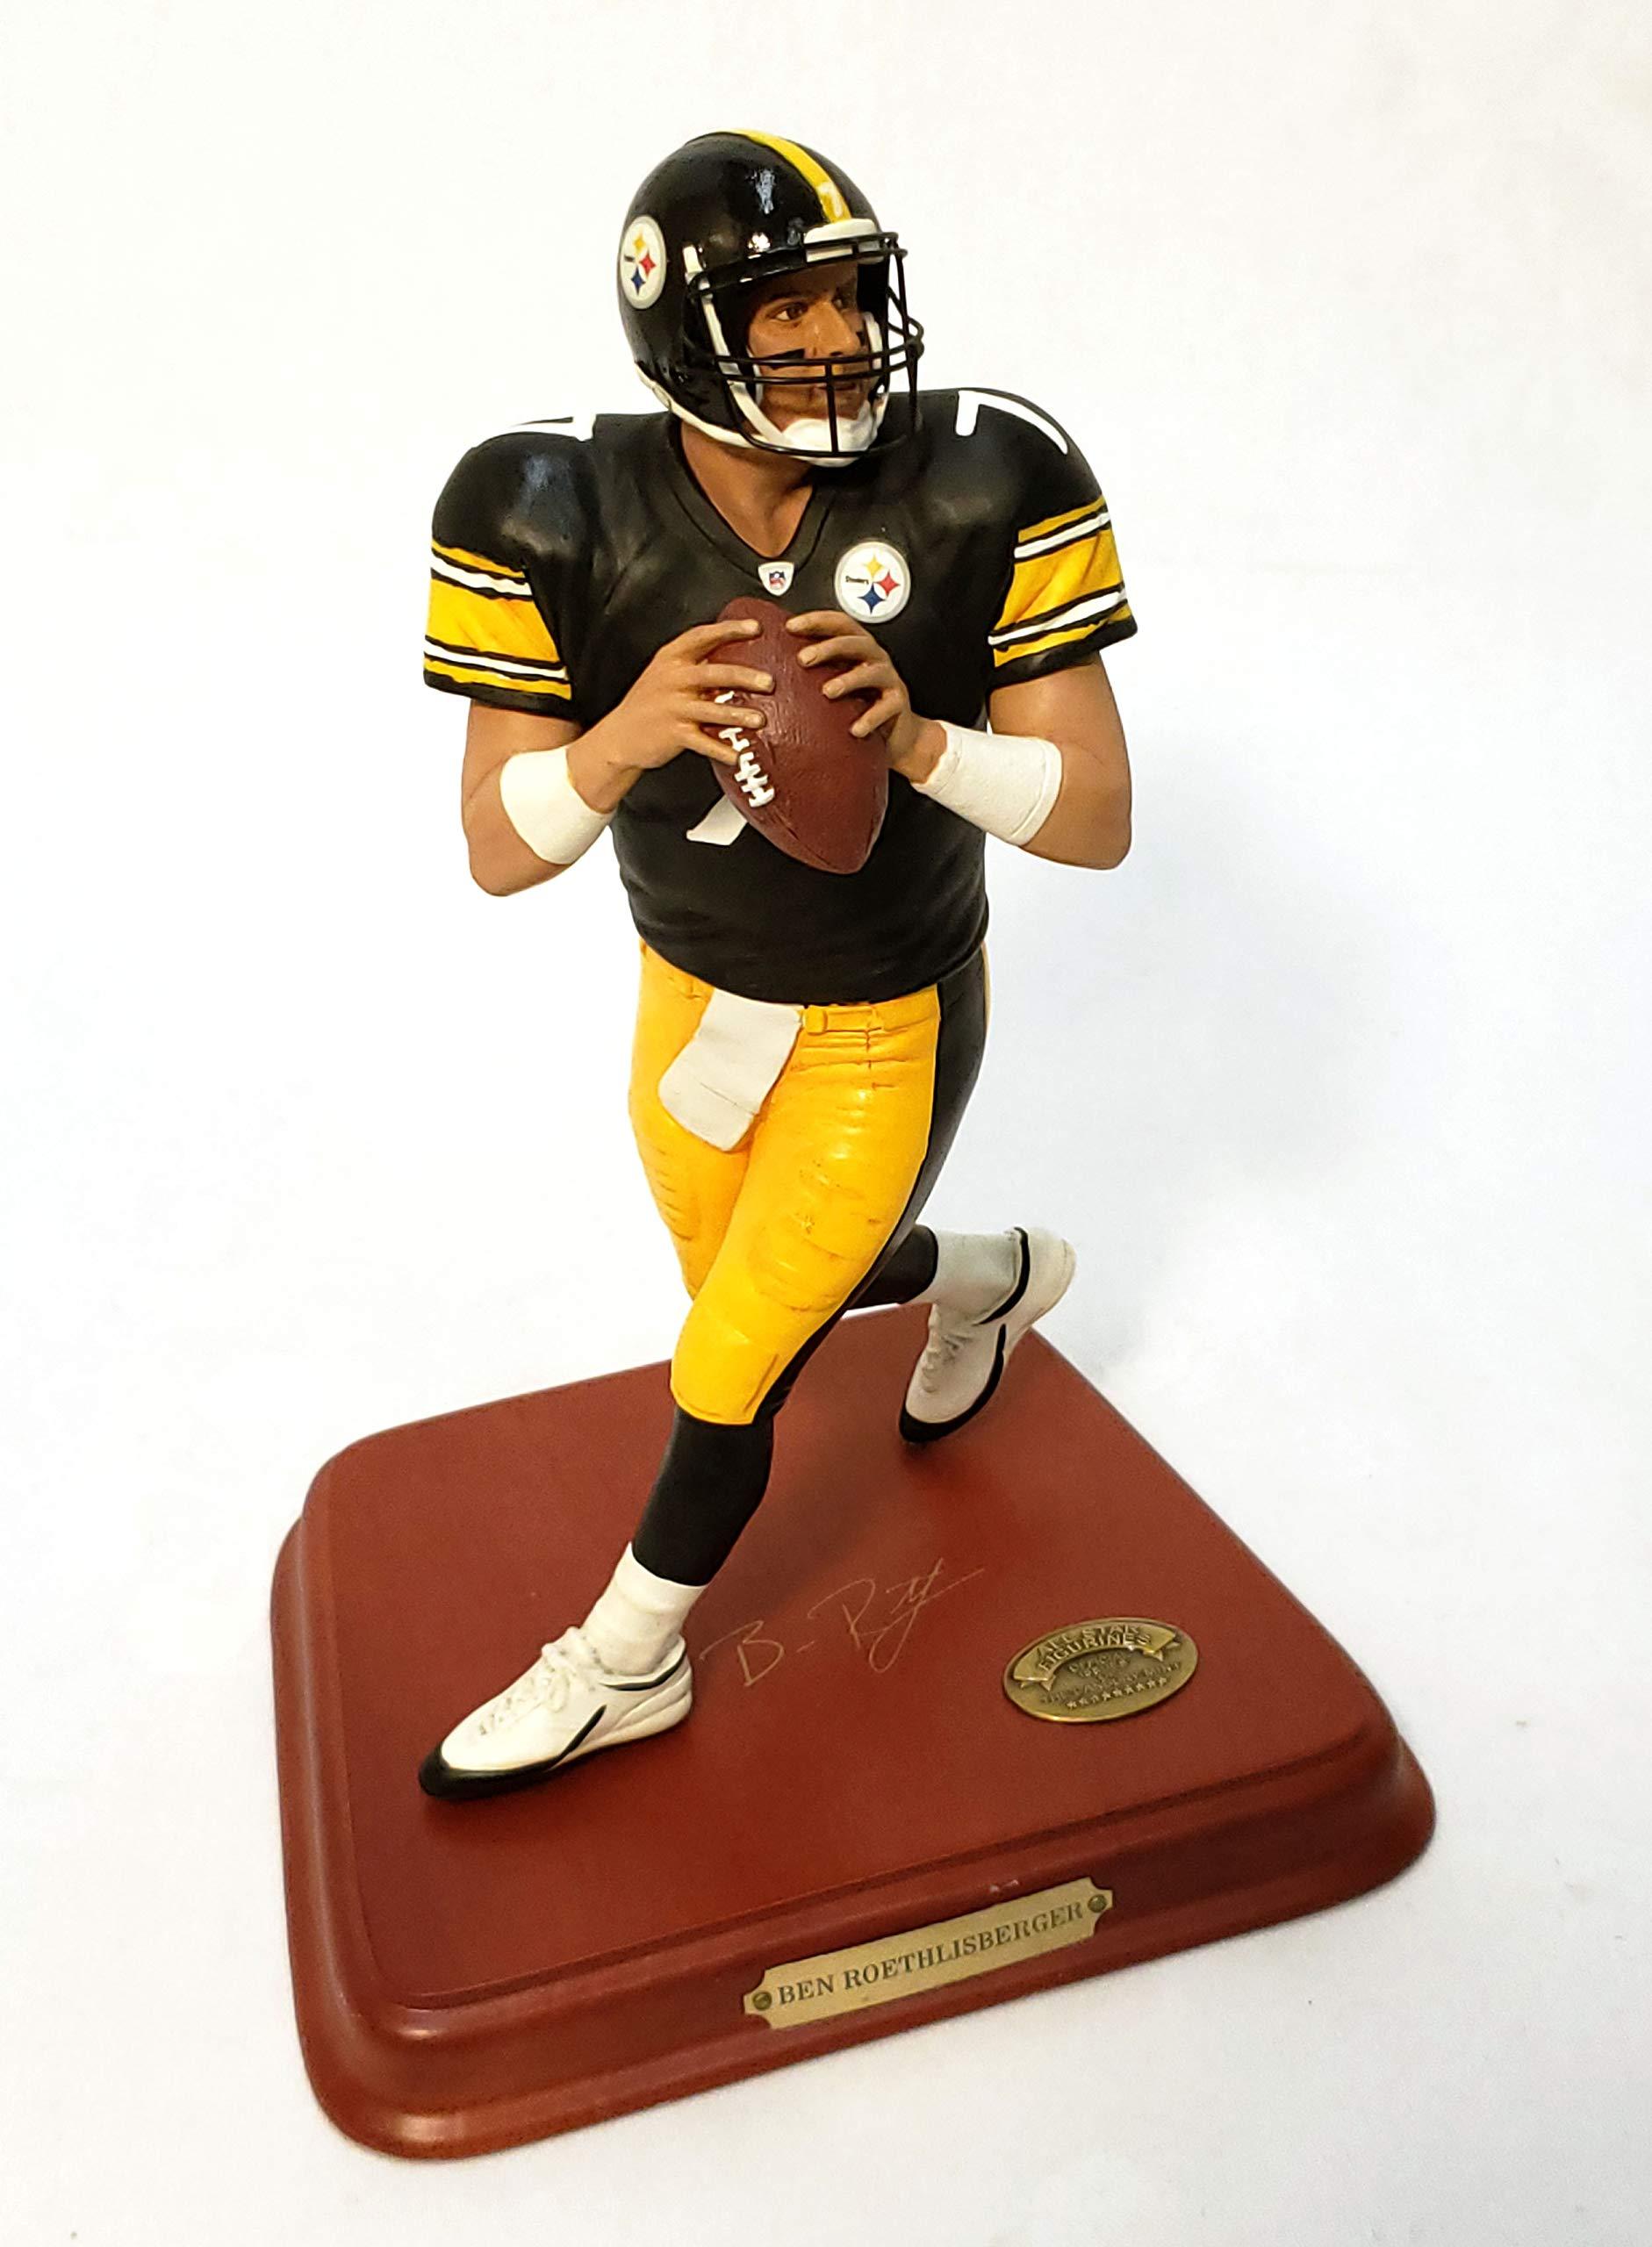 Pittsburgh Steelers Ben Roethlisberger Danbury Mint Statue Figurine w/COA